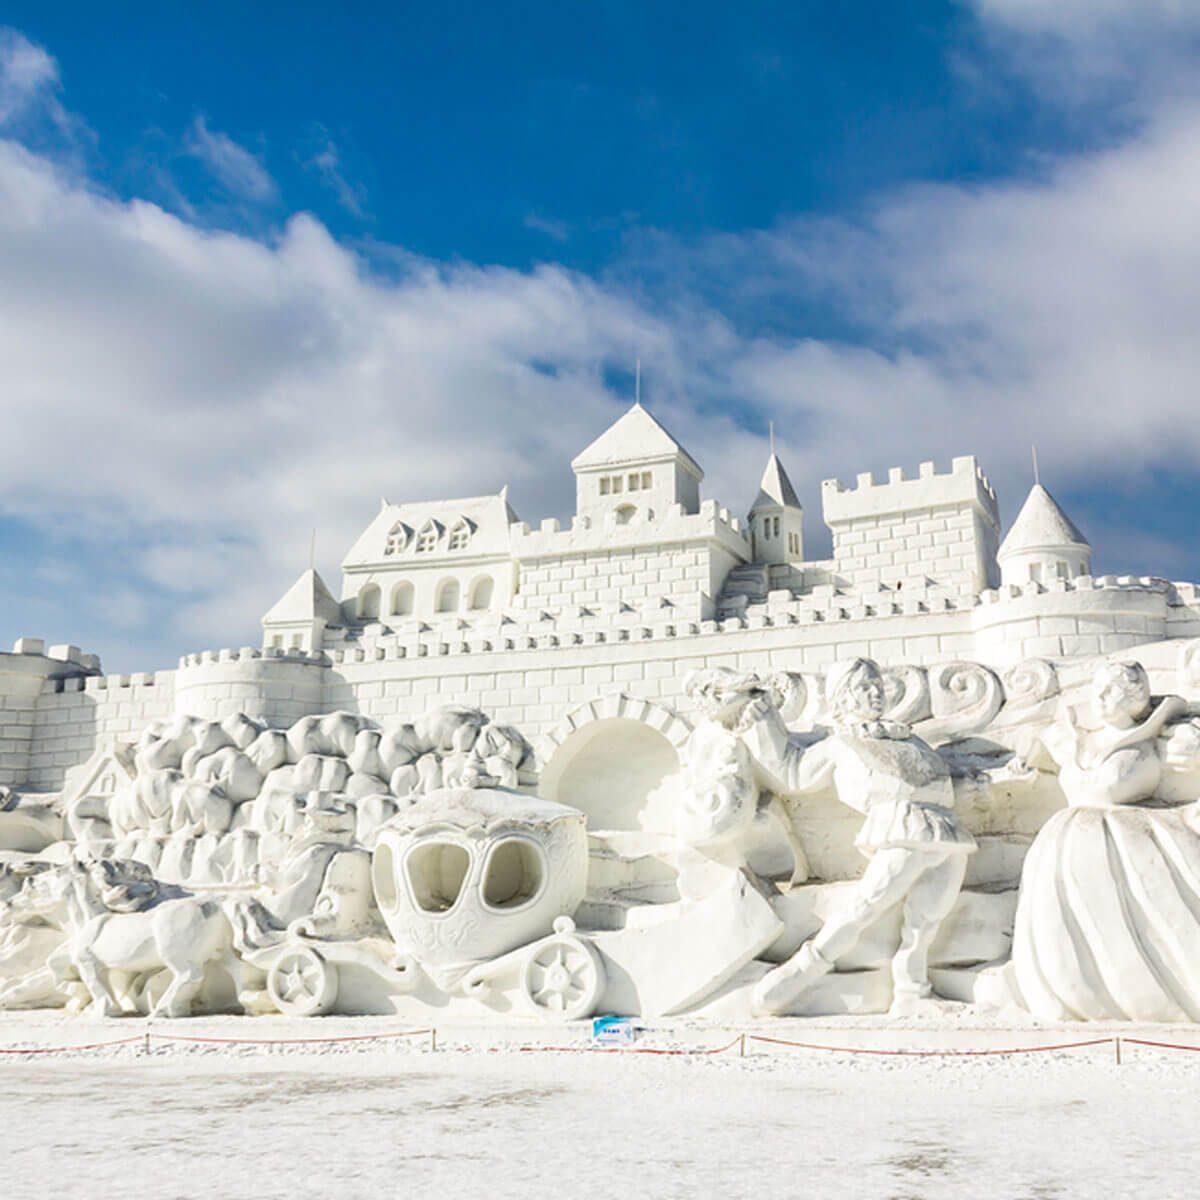 shutterstock_513712906 snow fort castle